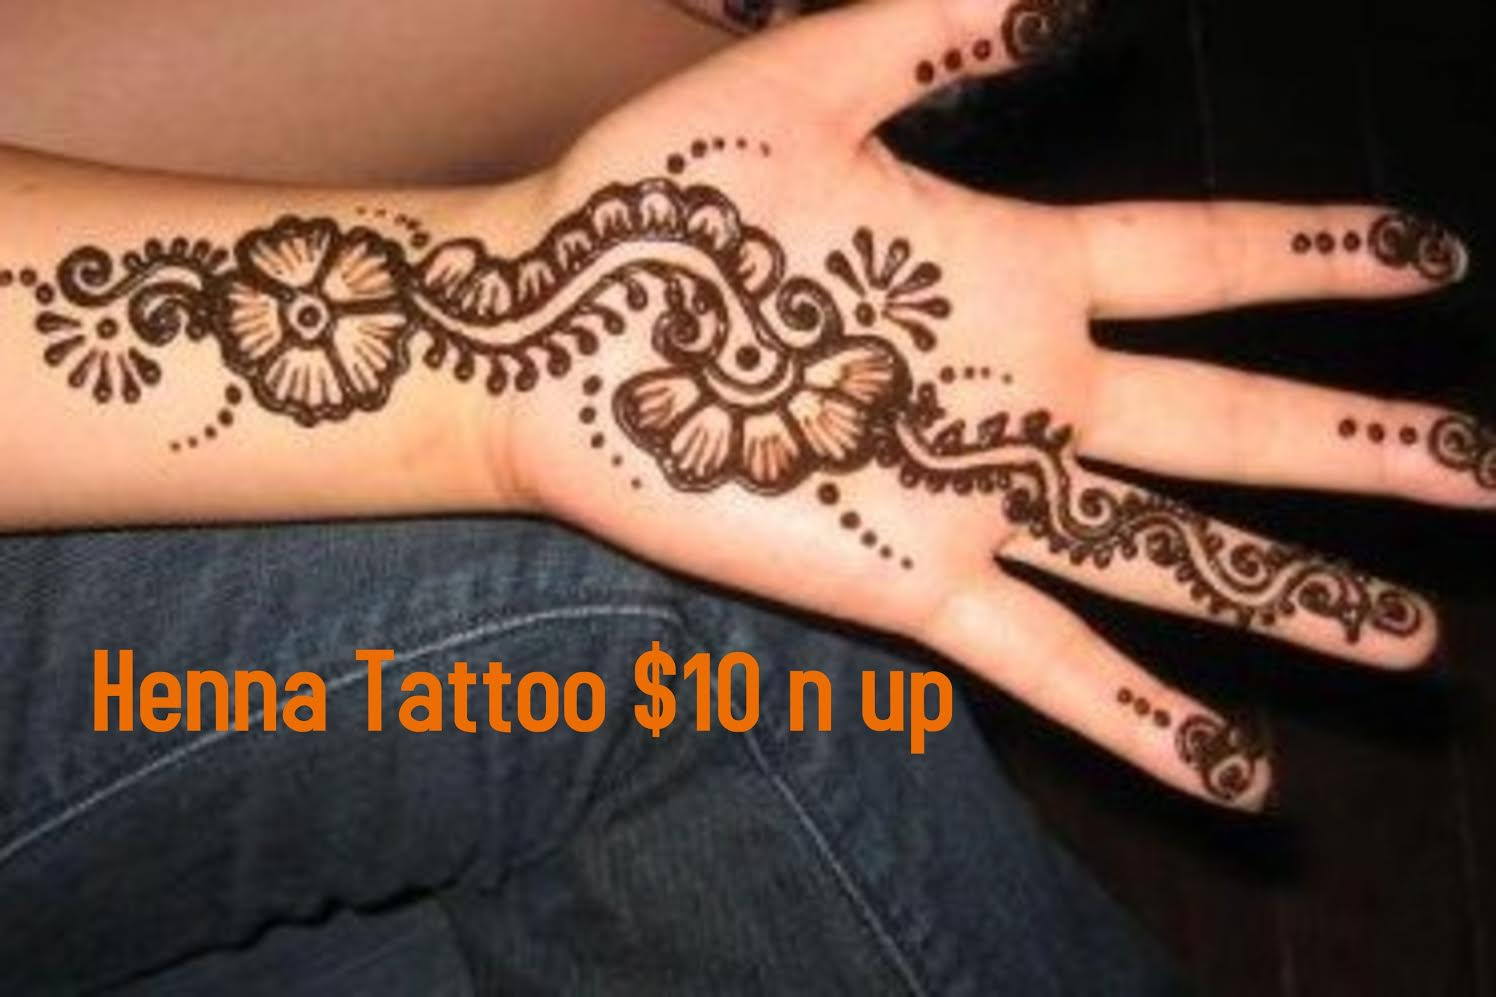 Eyebrow threading in dallas tx for Henna tattoo richardson tx